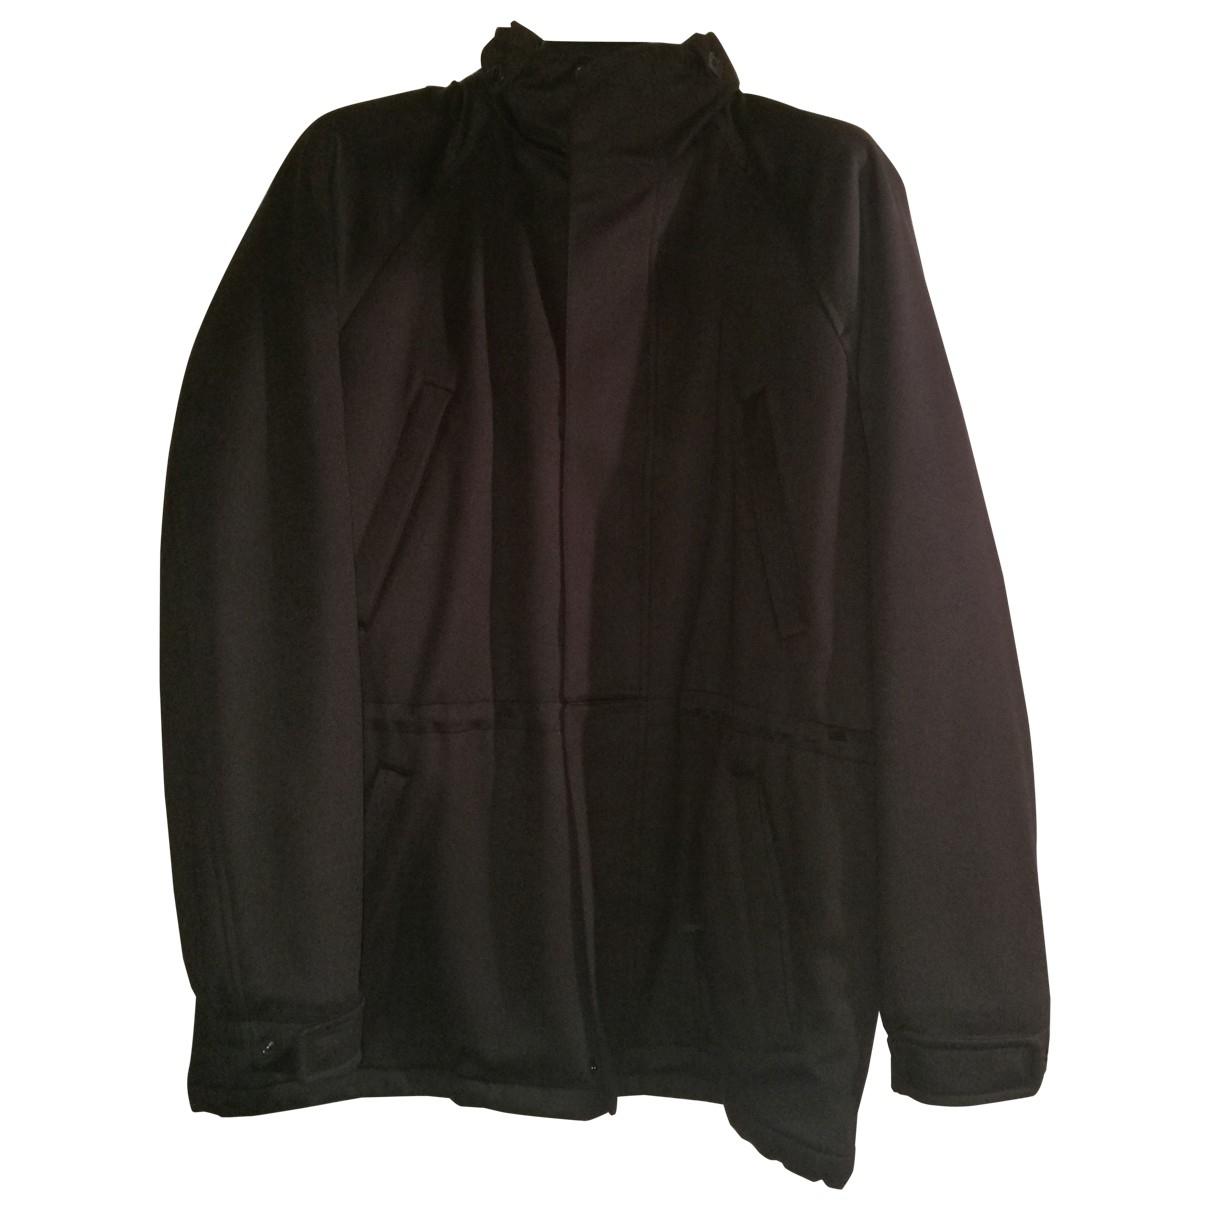 Loro Piana \N Black Cashmere jacket  for Men L International